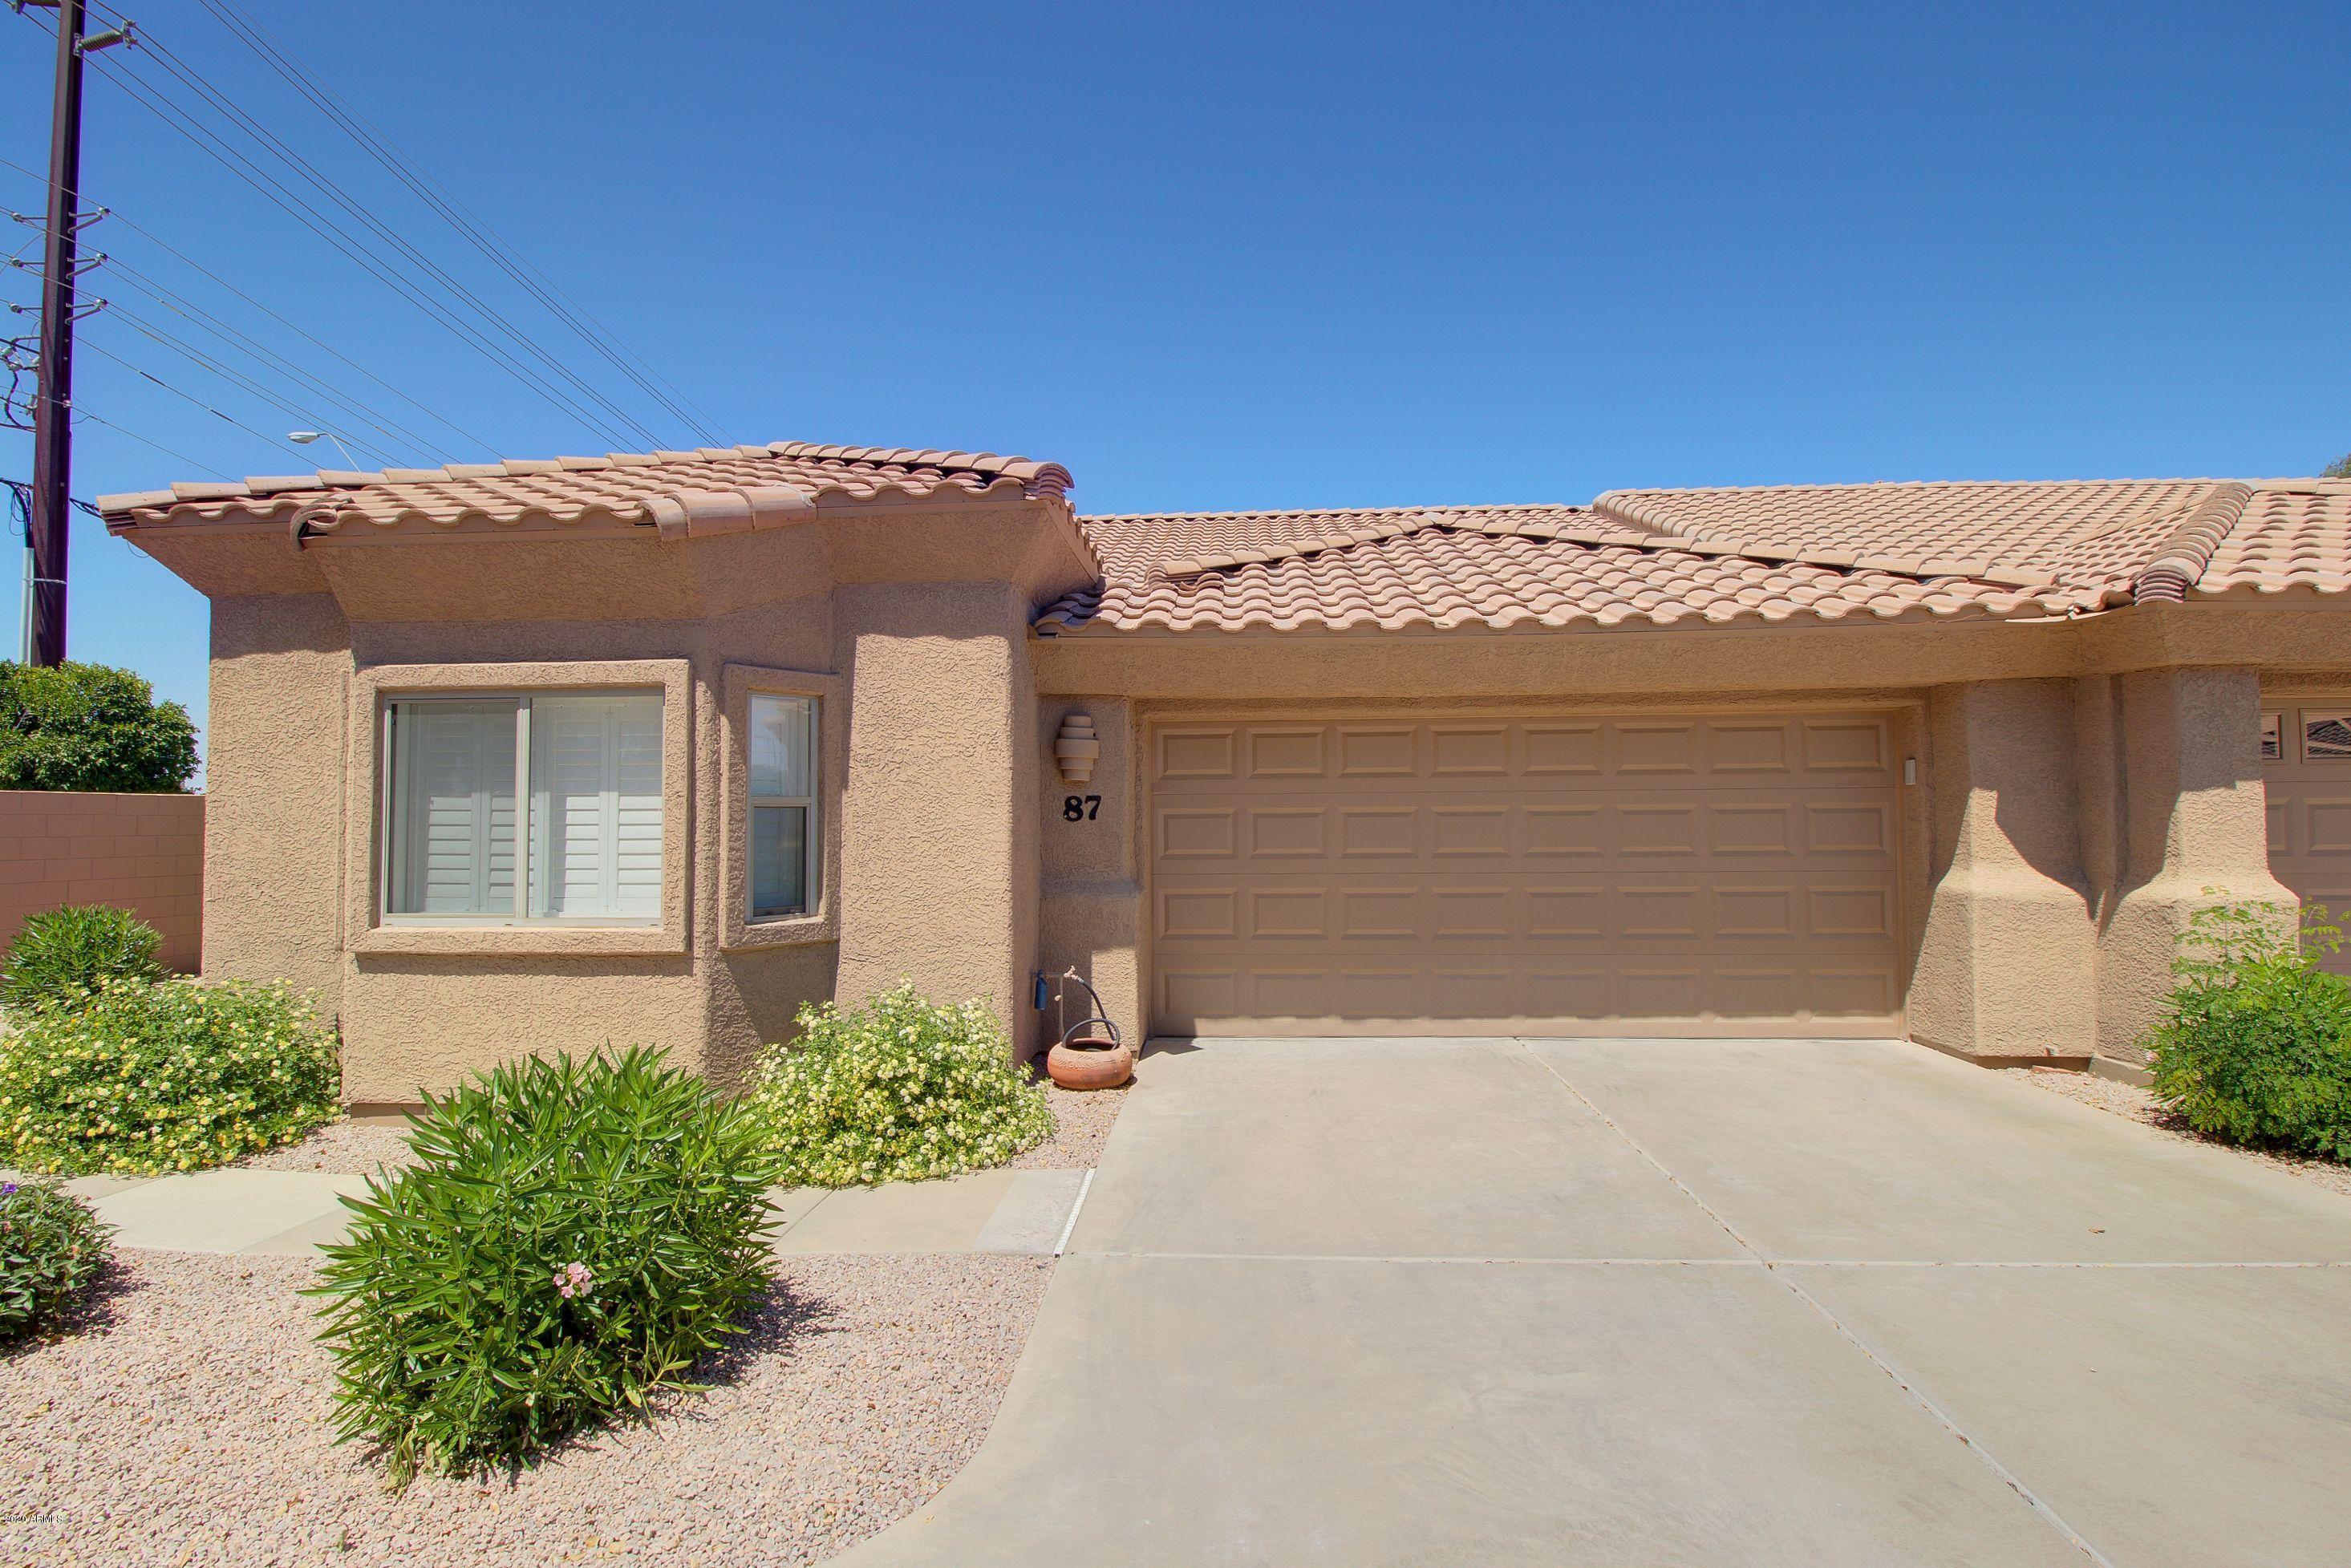 Photo of 4202 E BROADWAY Road #87, Mesa, AZ 85206